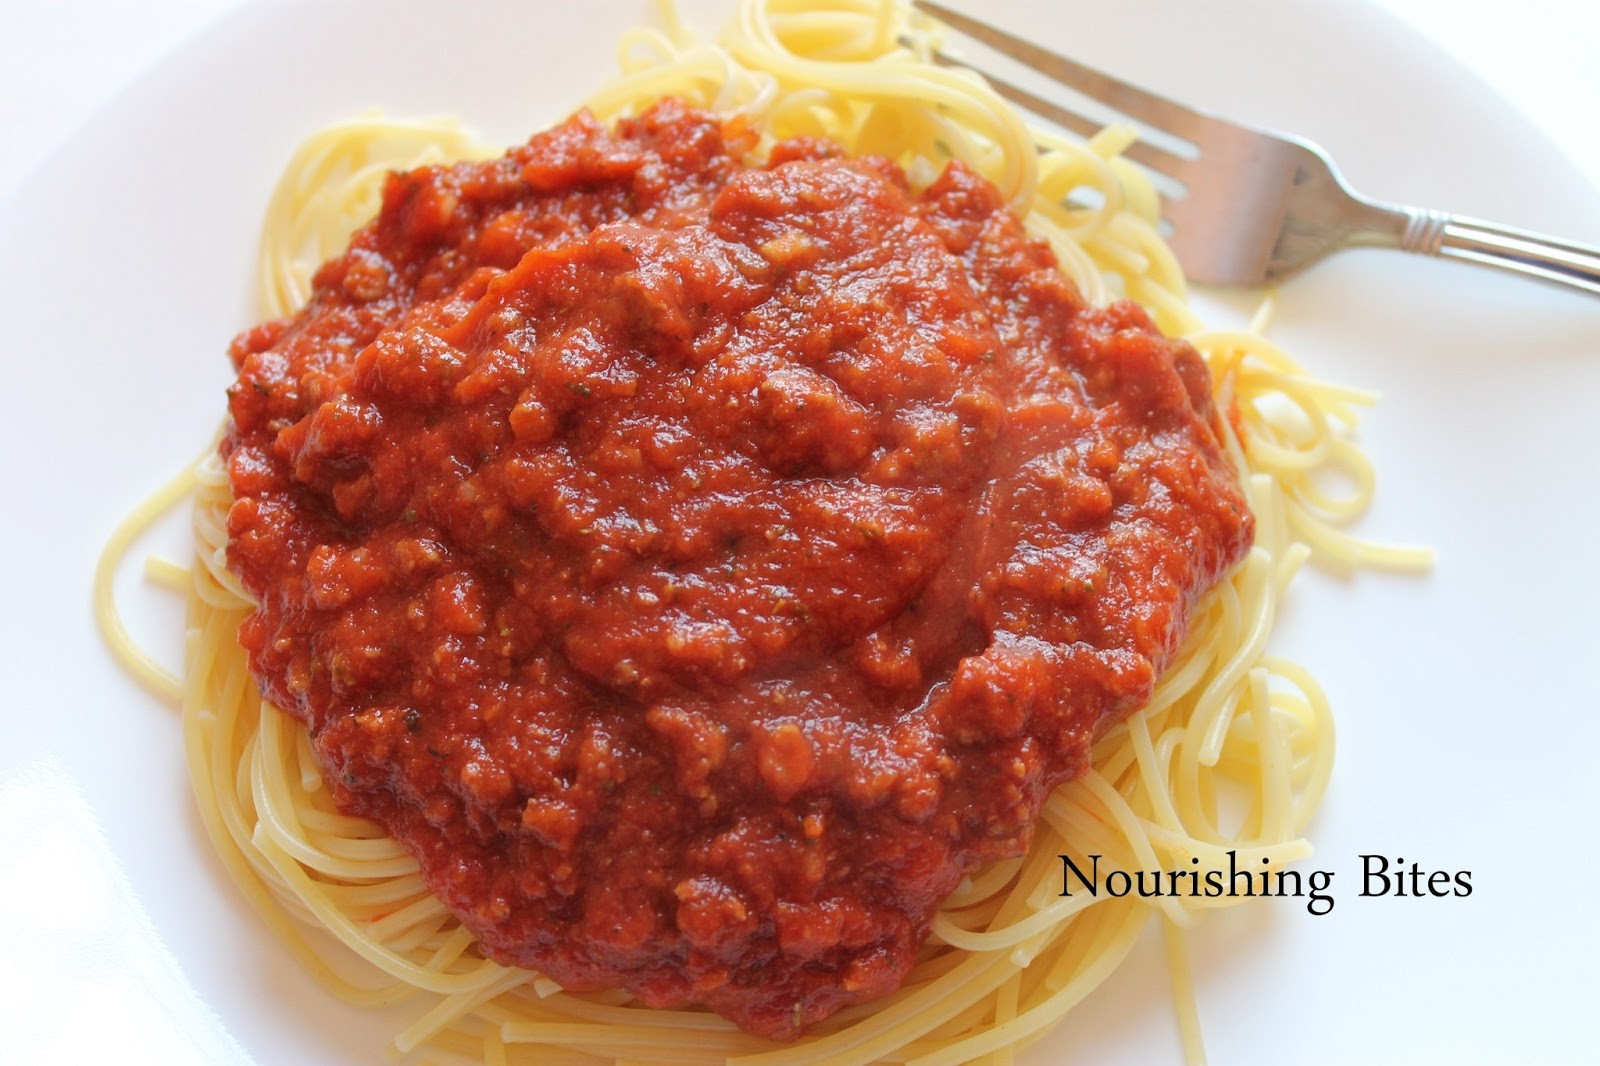 Nourishing Bites: Mom's Spaghetti Sauce